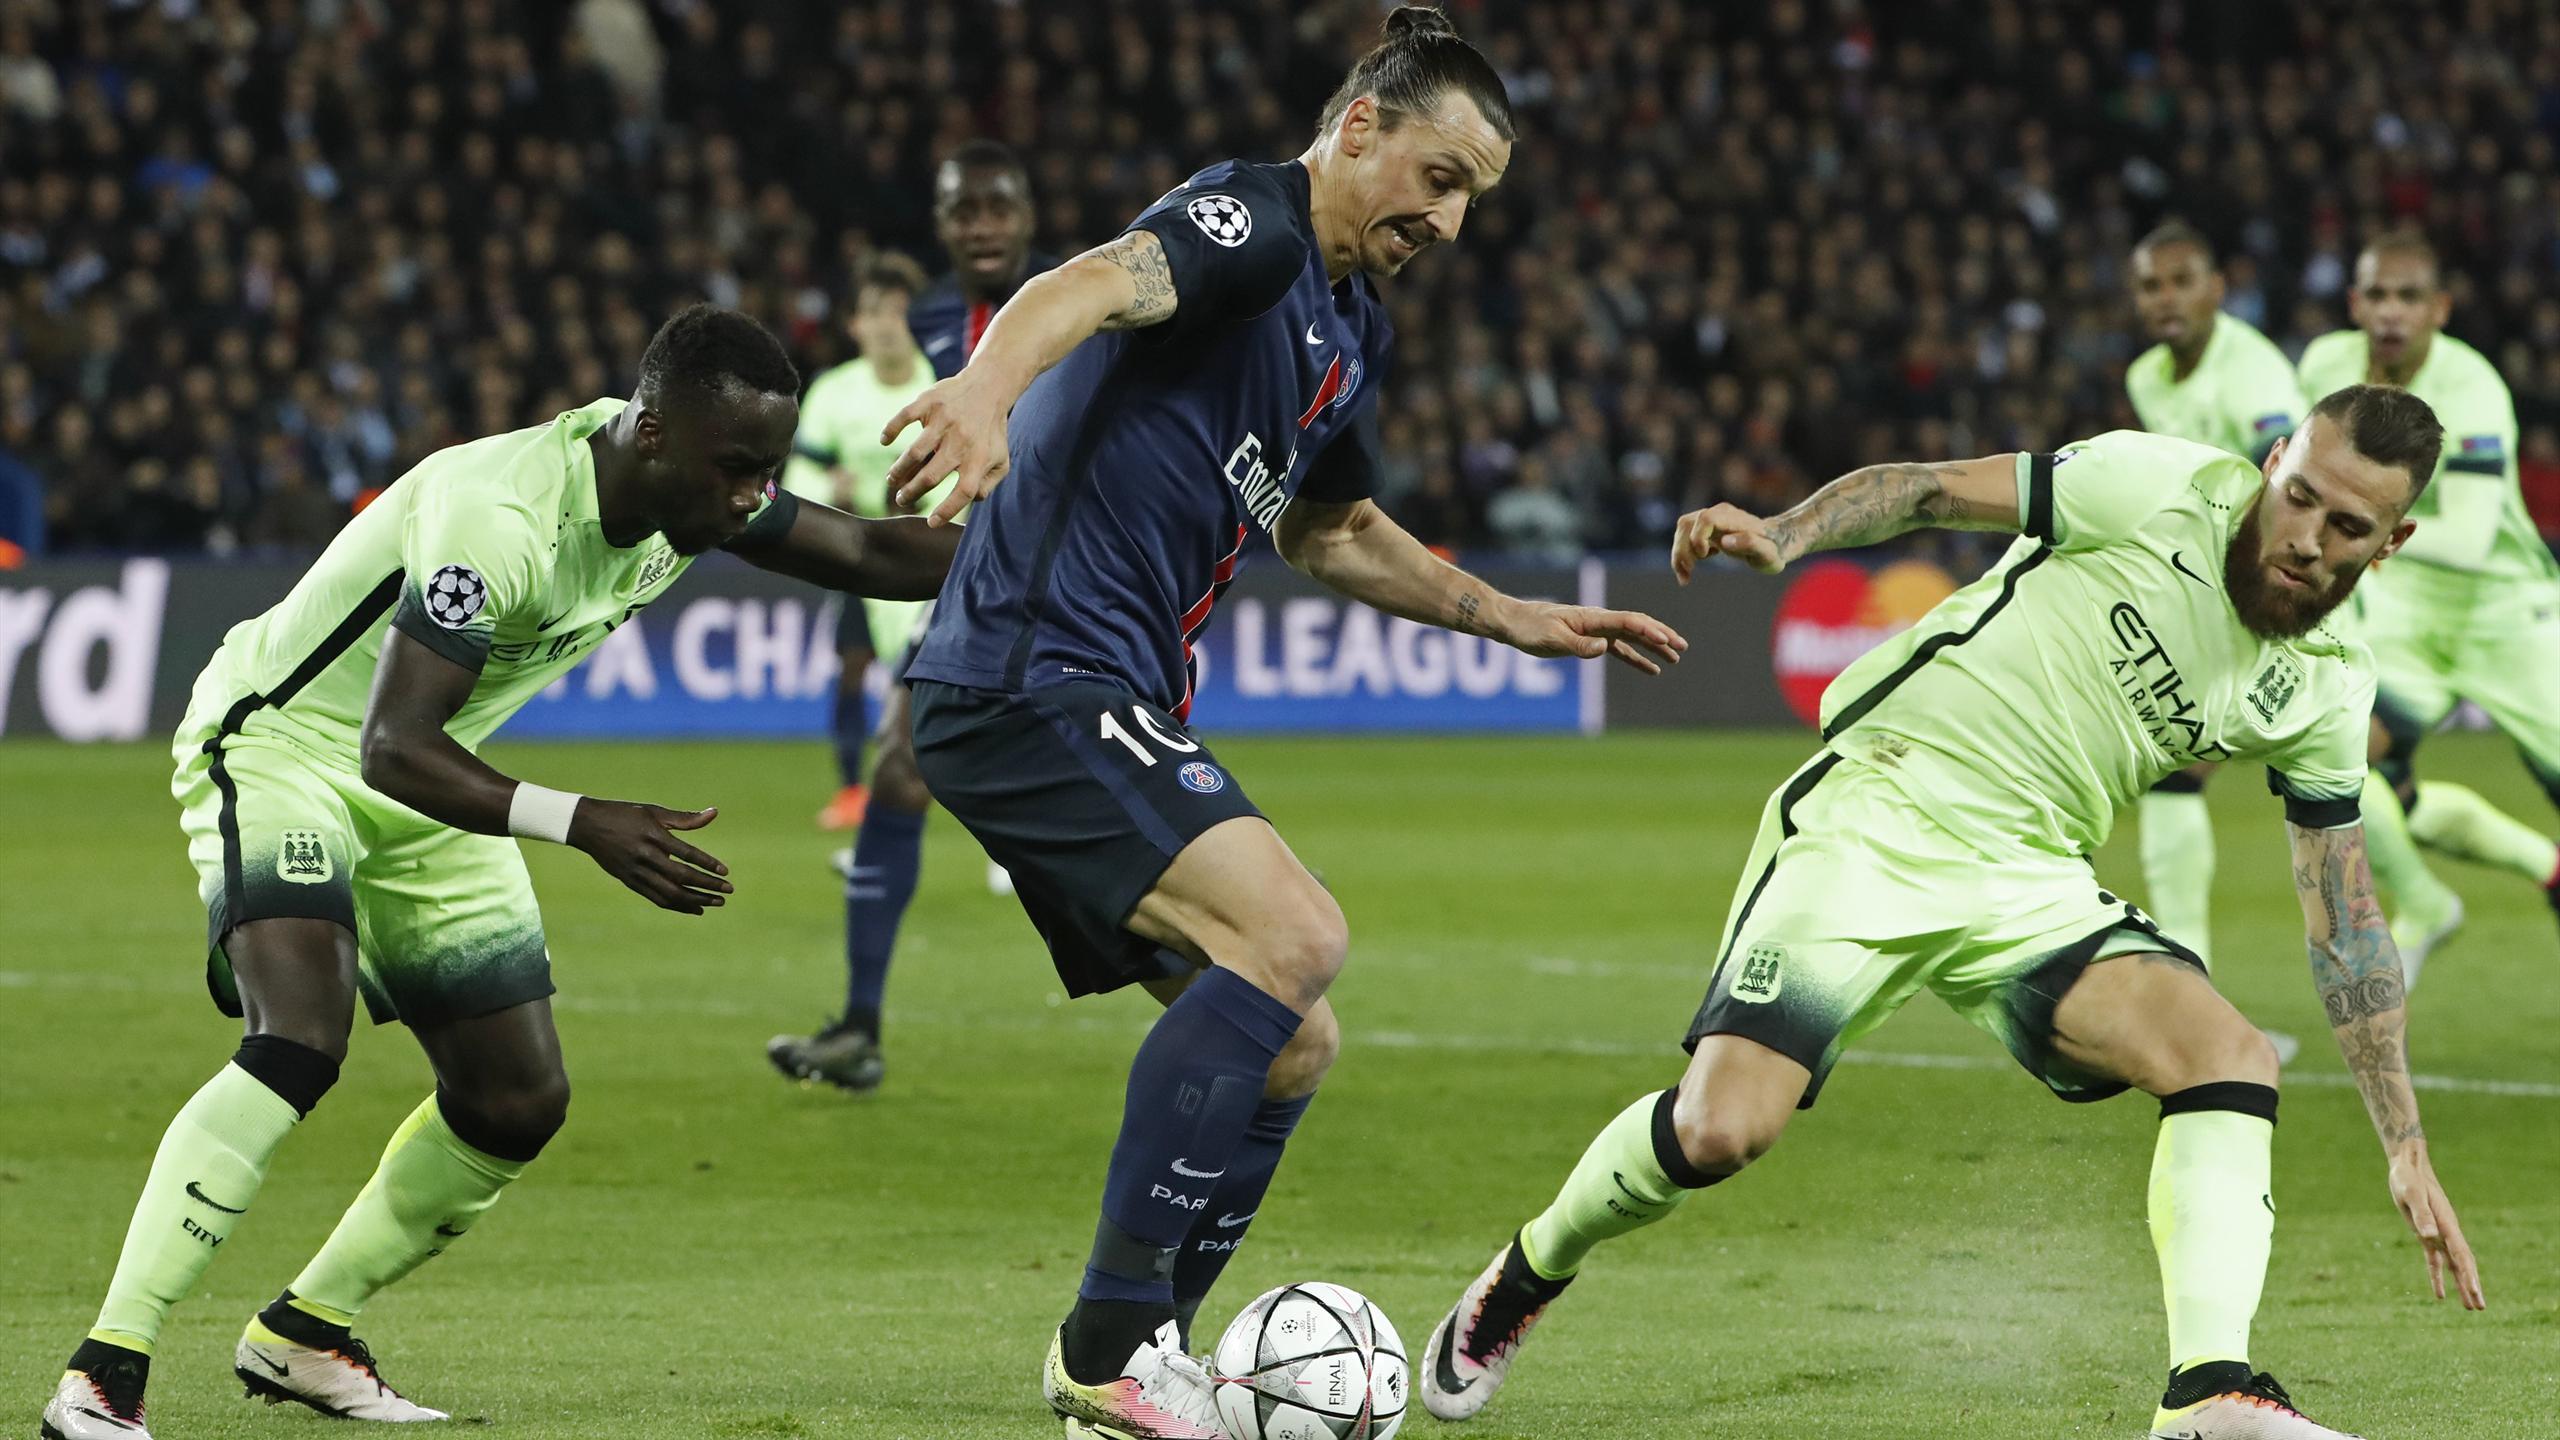 Manchester City's Nicolas Otamendi in action with PSG's Zlatan Ibrahimovic